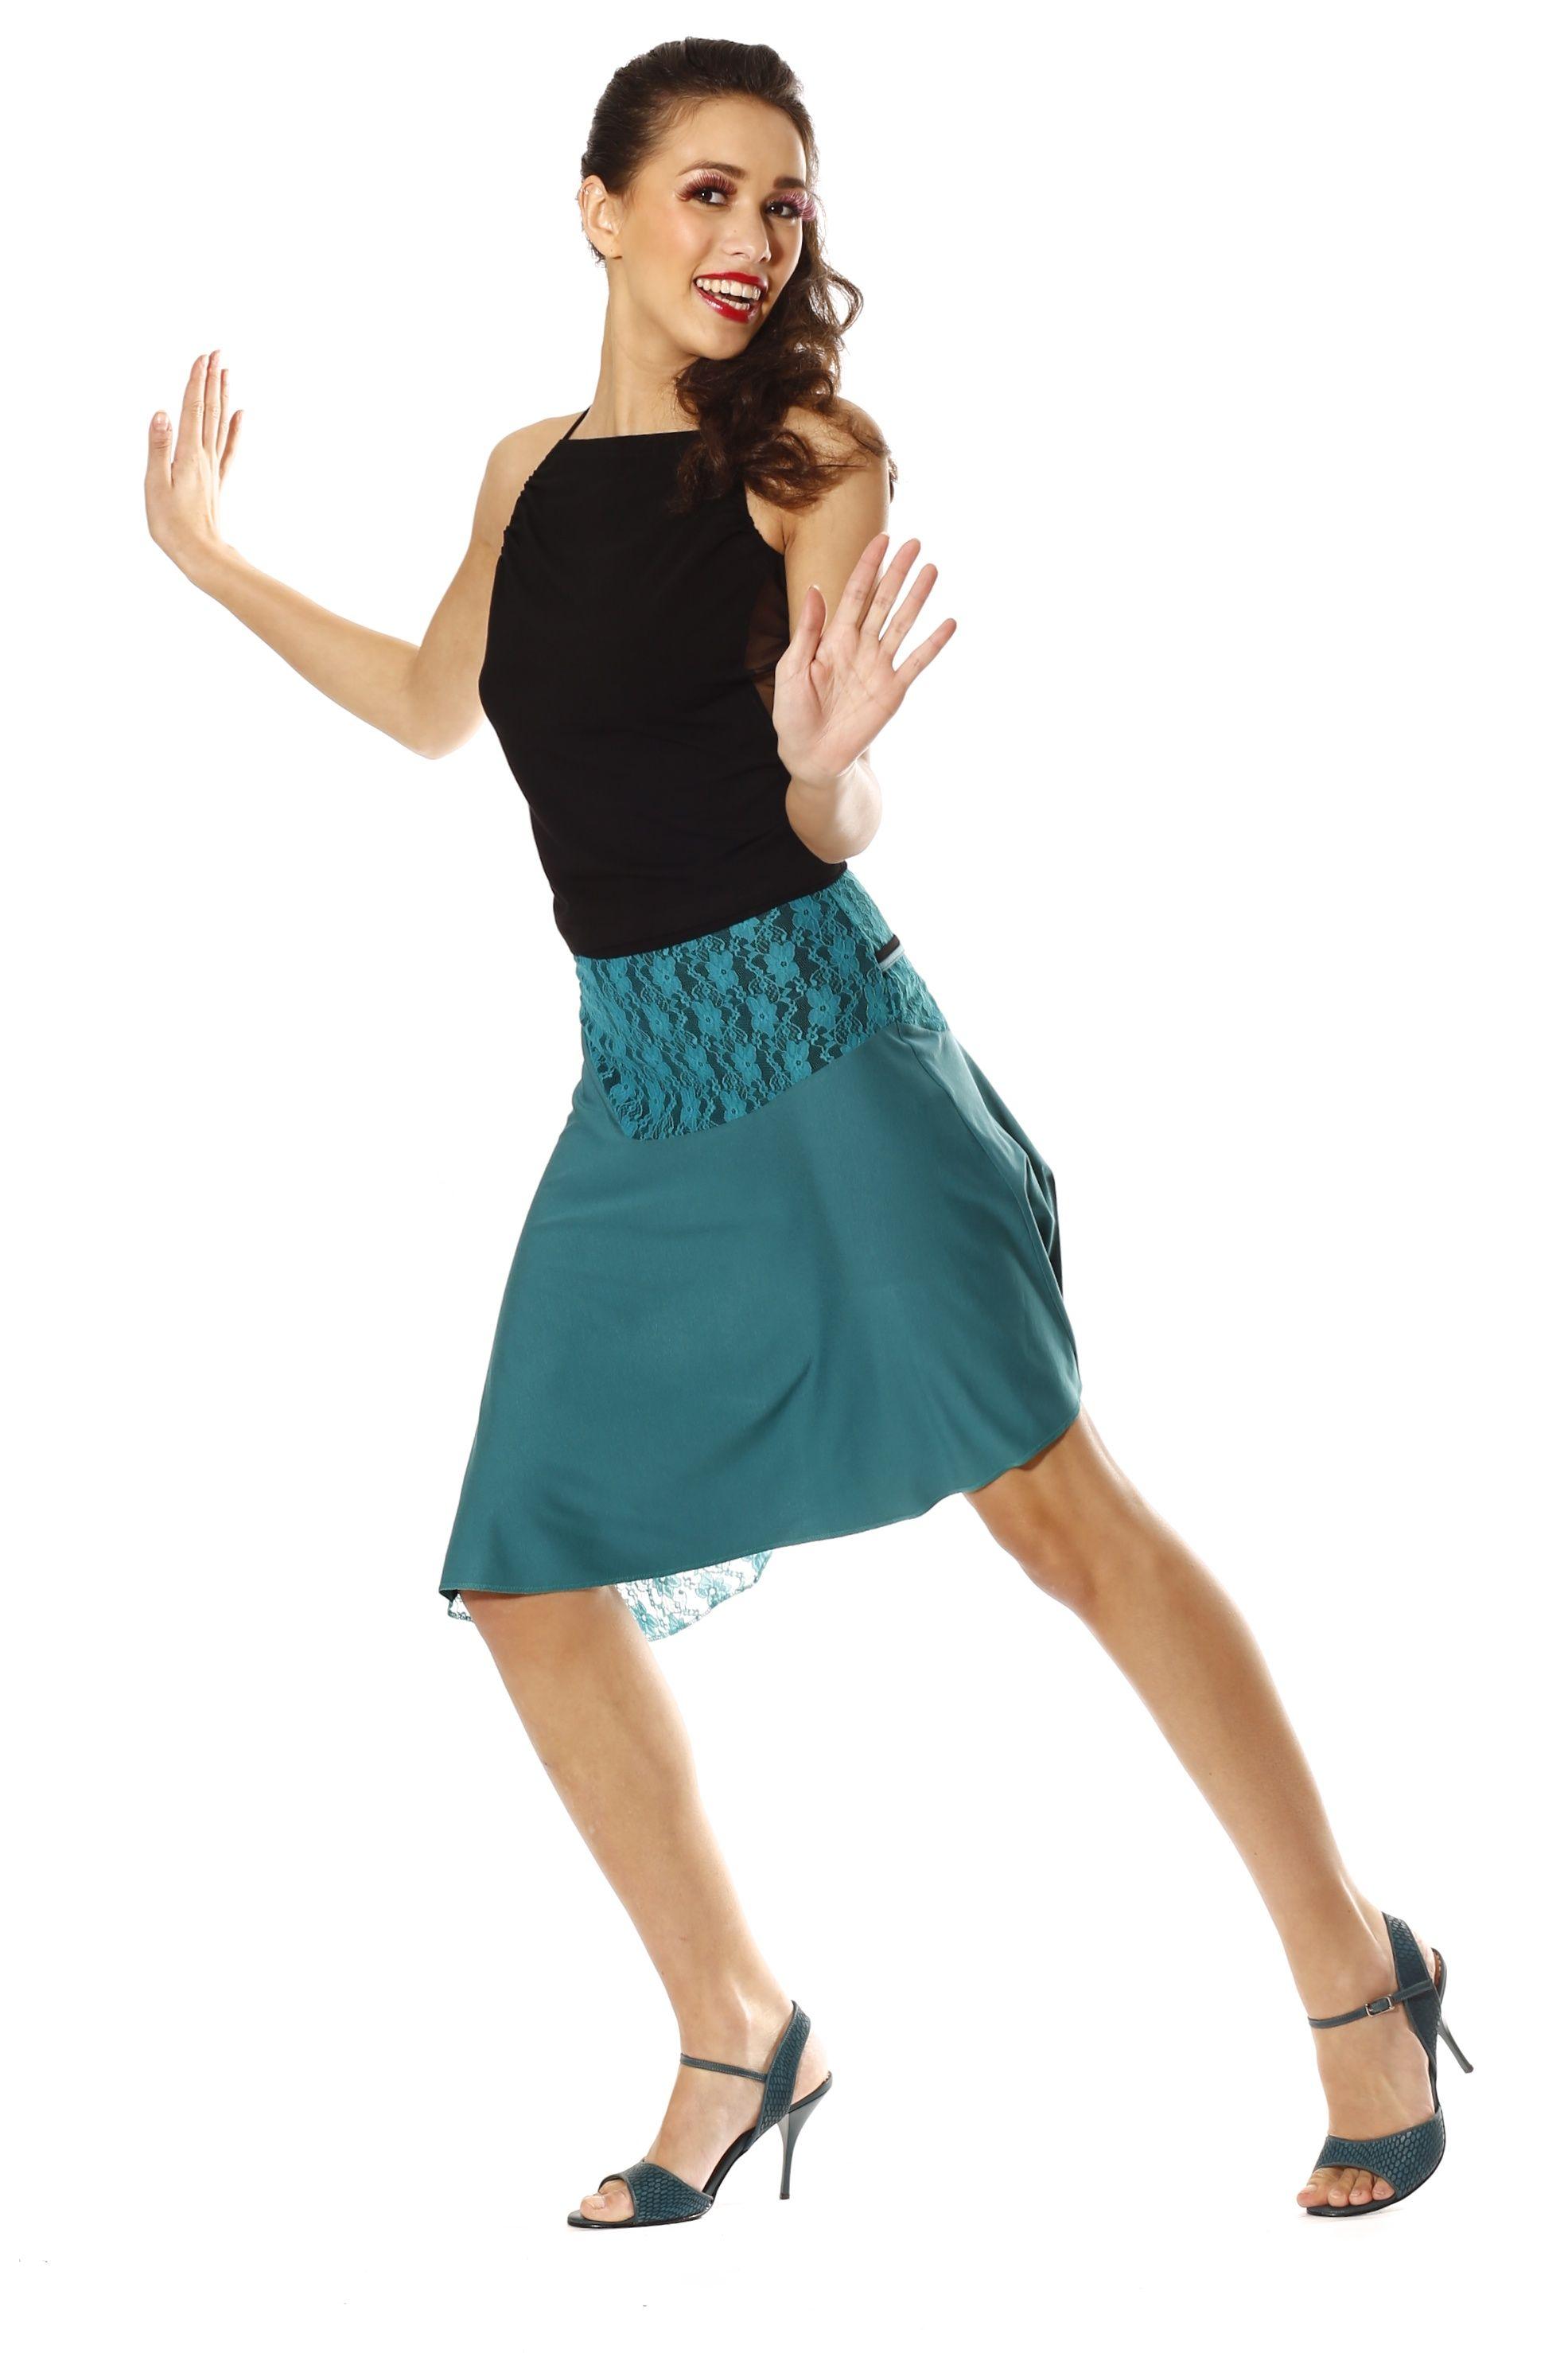 salsa & tango skirts - need a stunning dance skirt quick